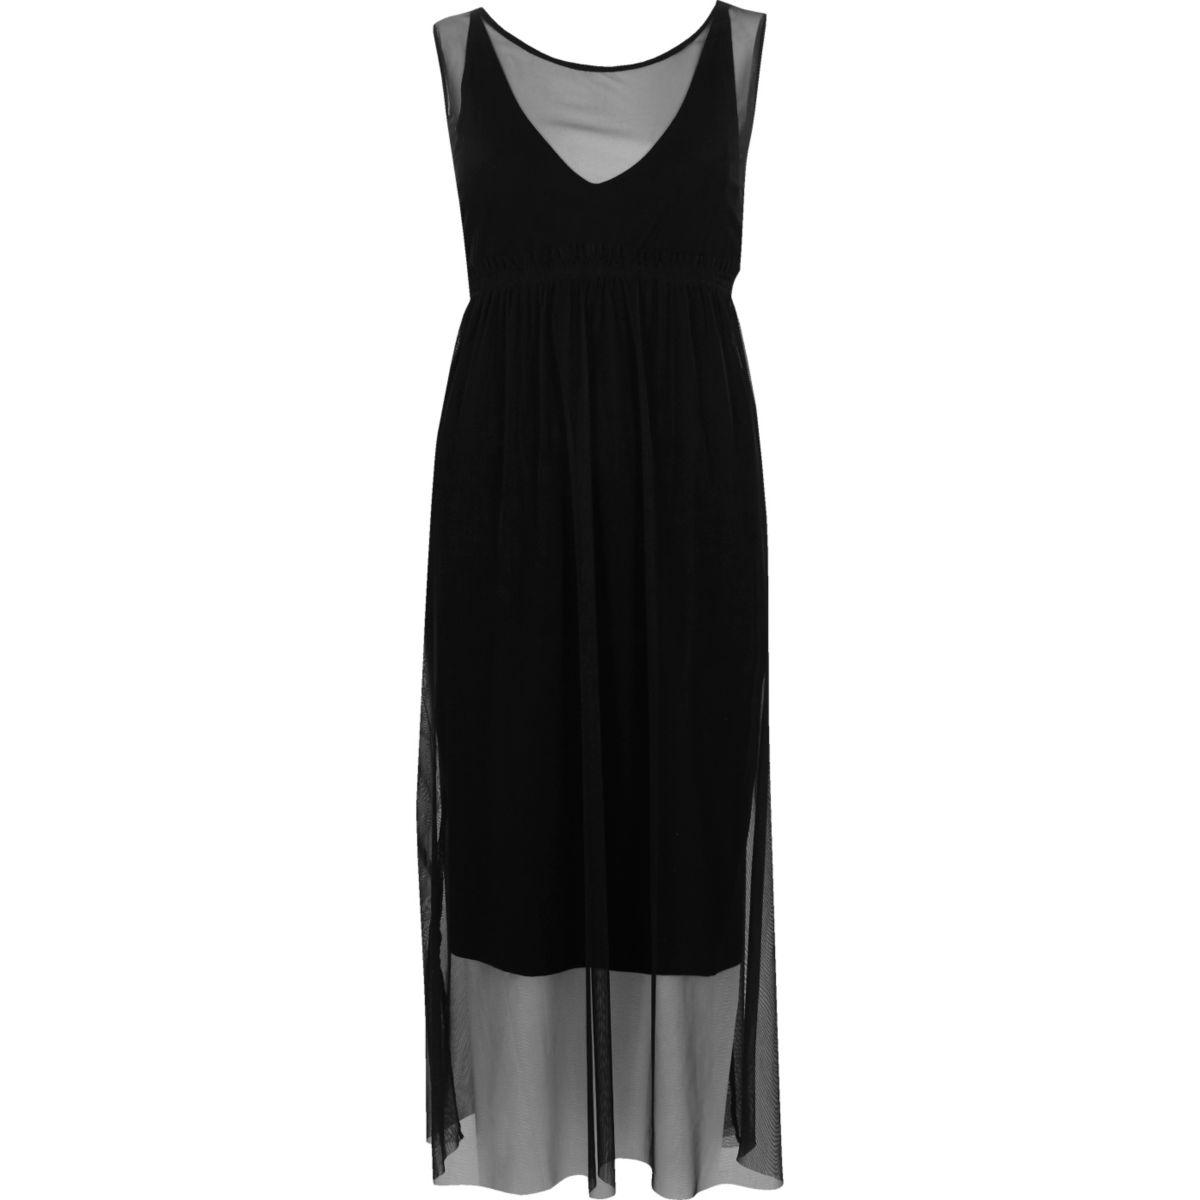 Black layered mesh dress